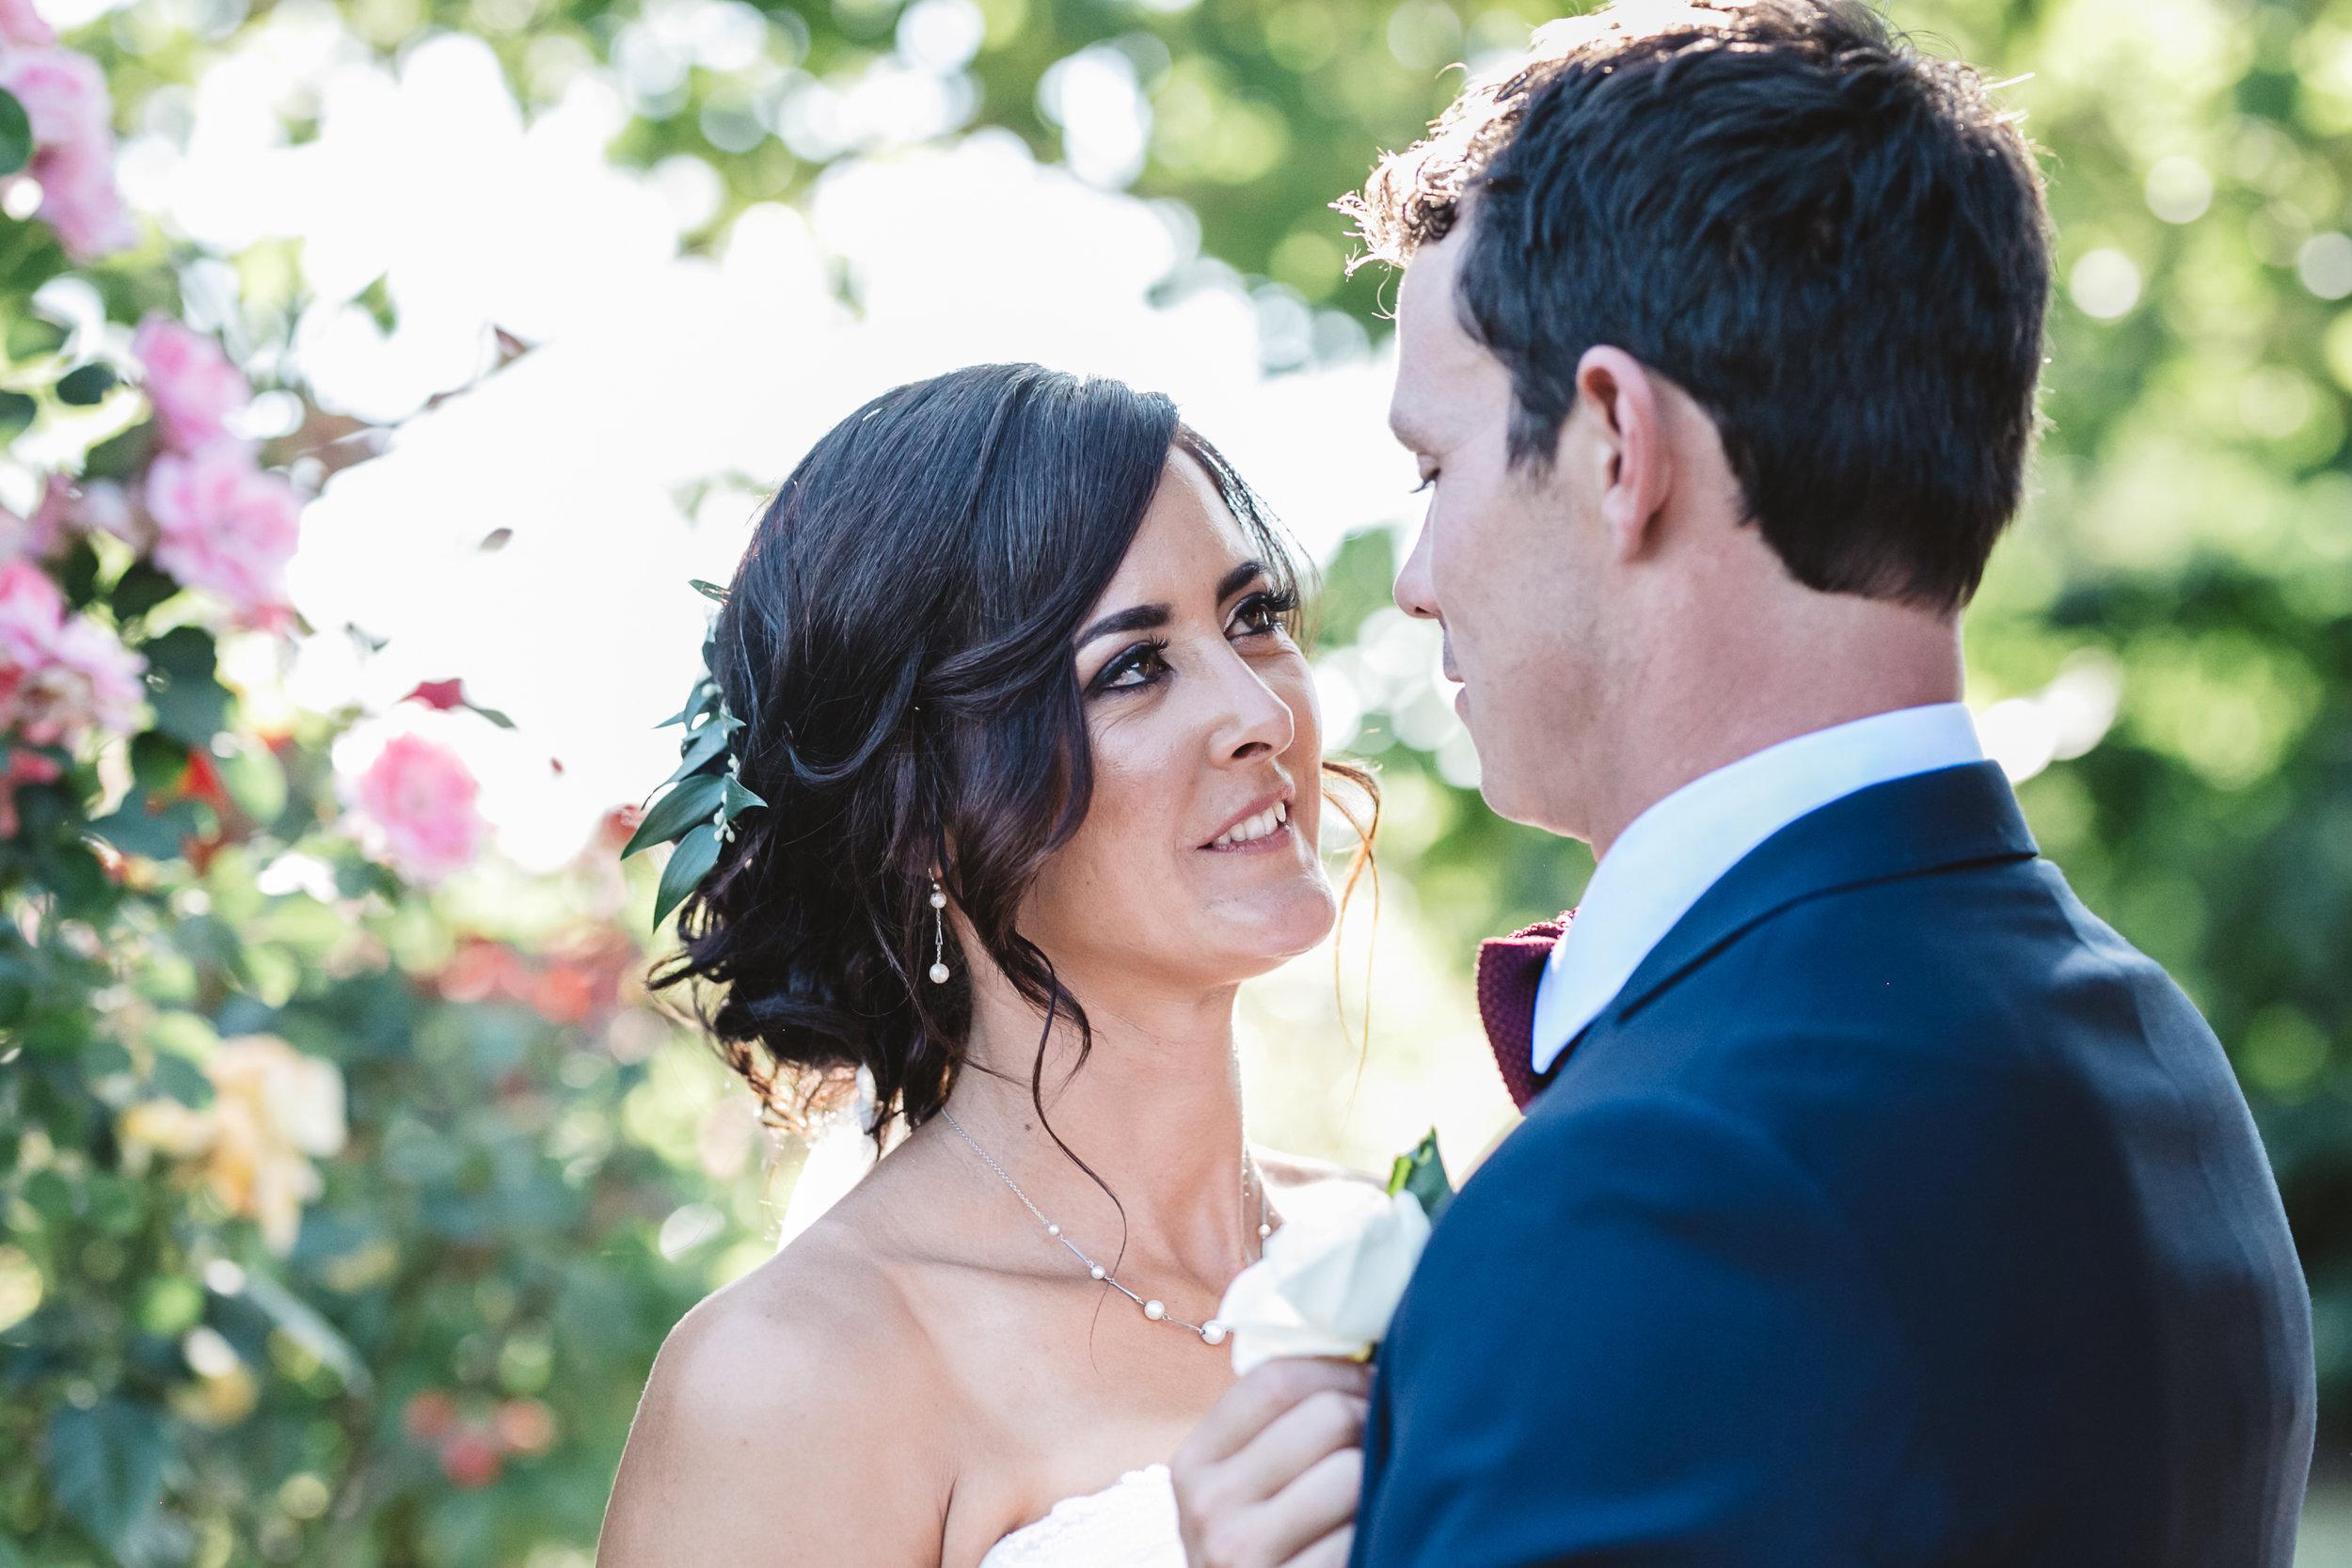 Portsea wedding photography for rad couples